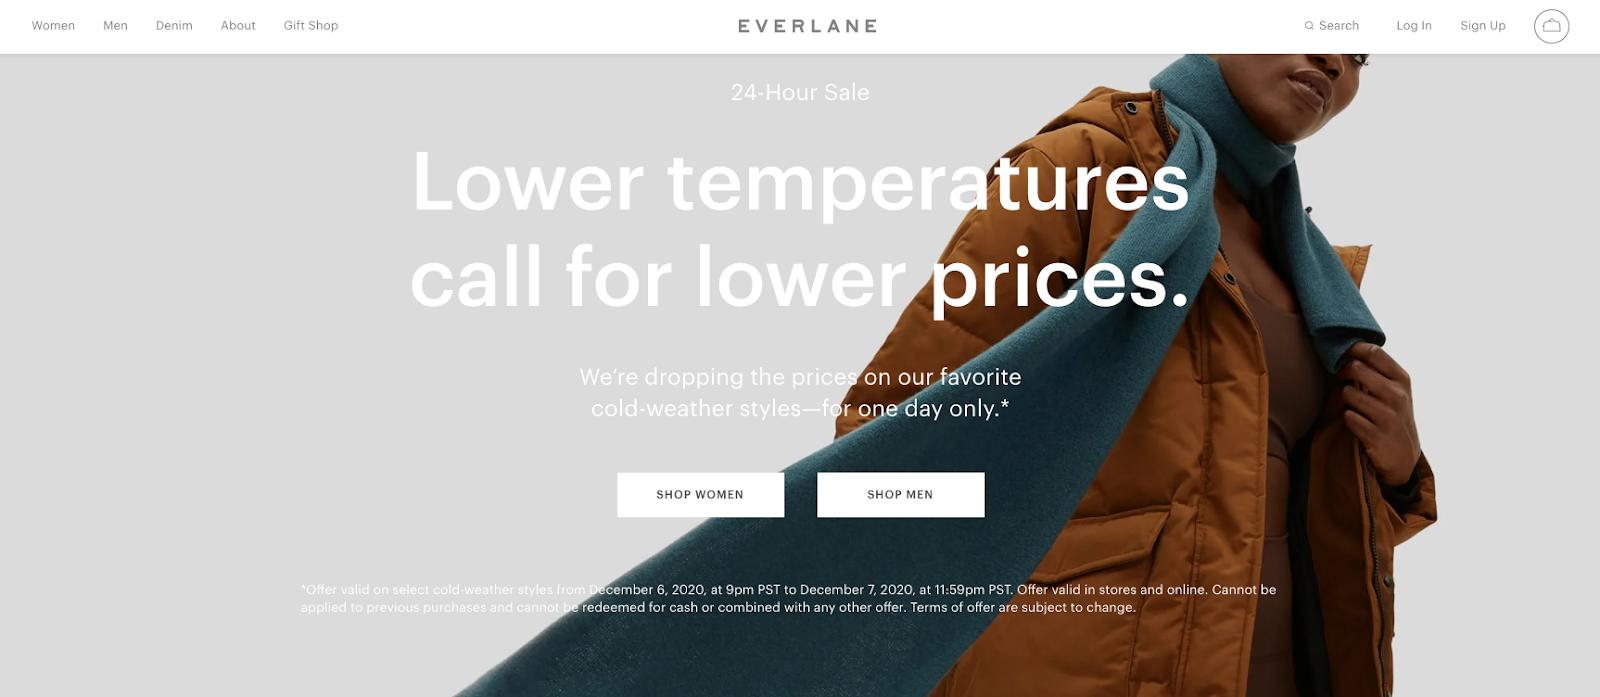 everlane homepage